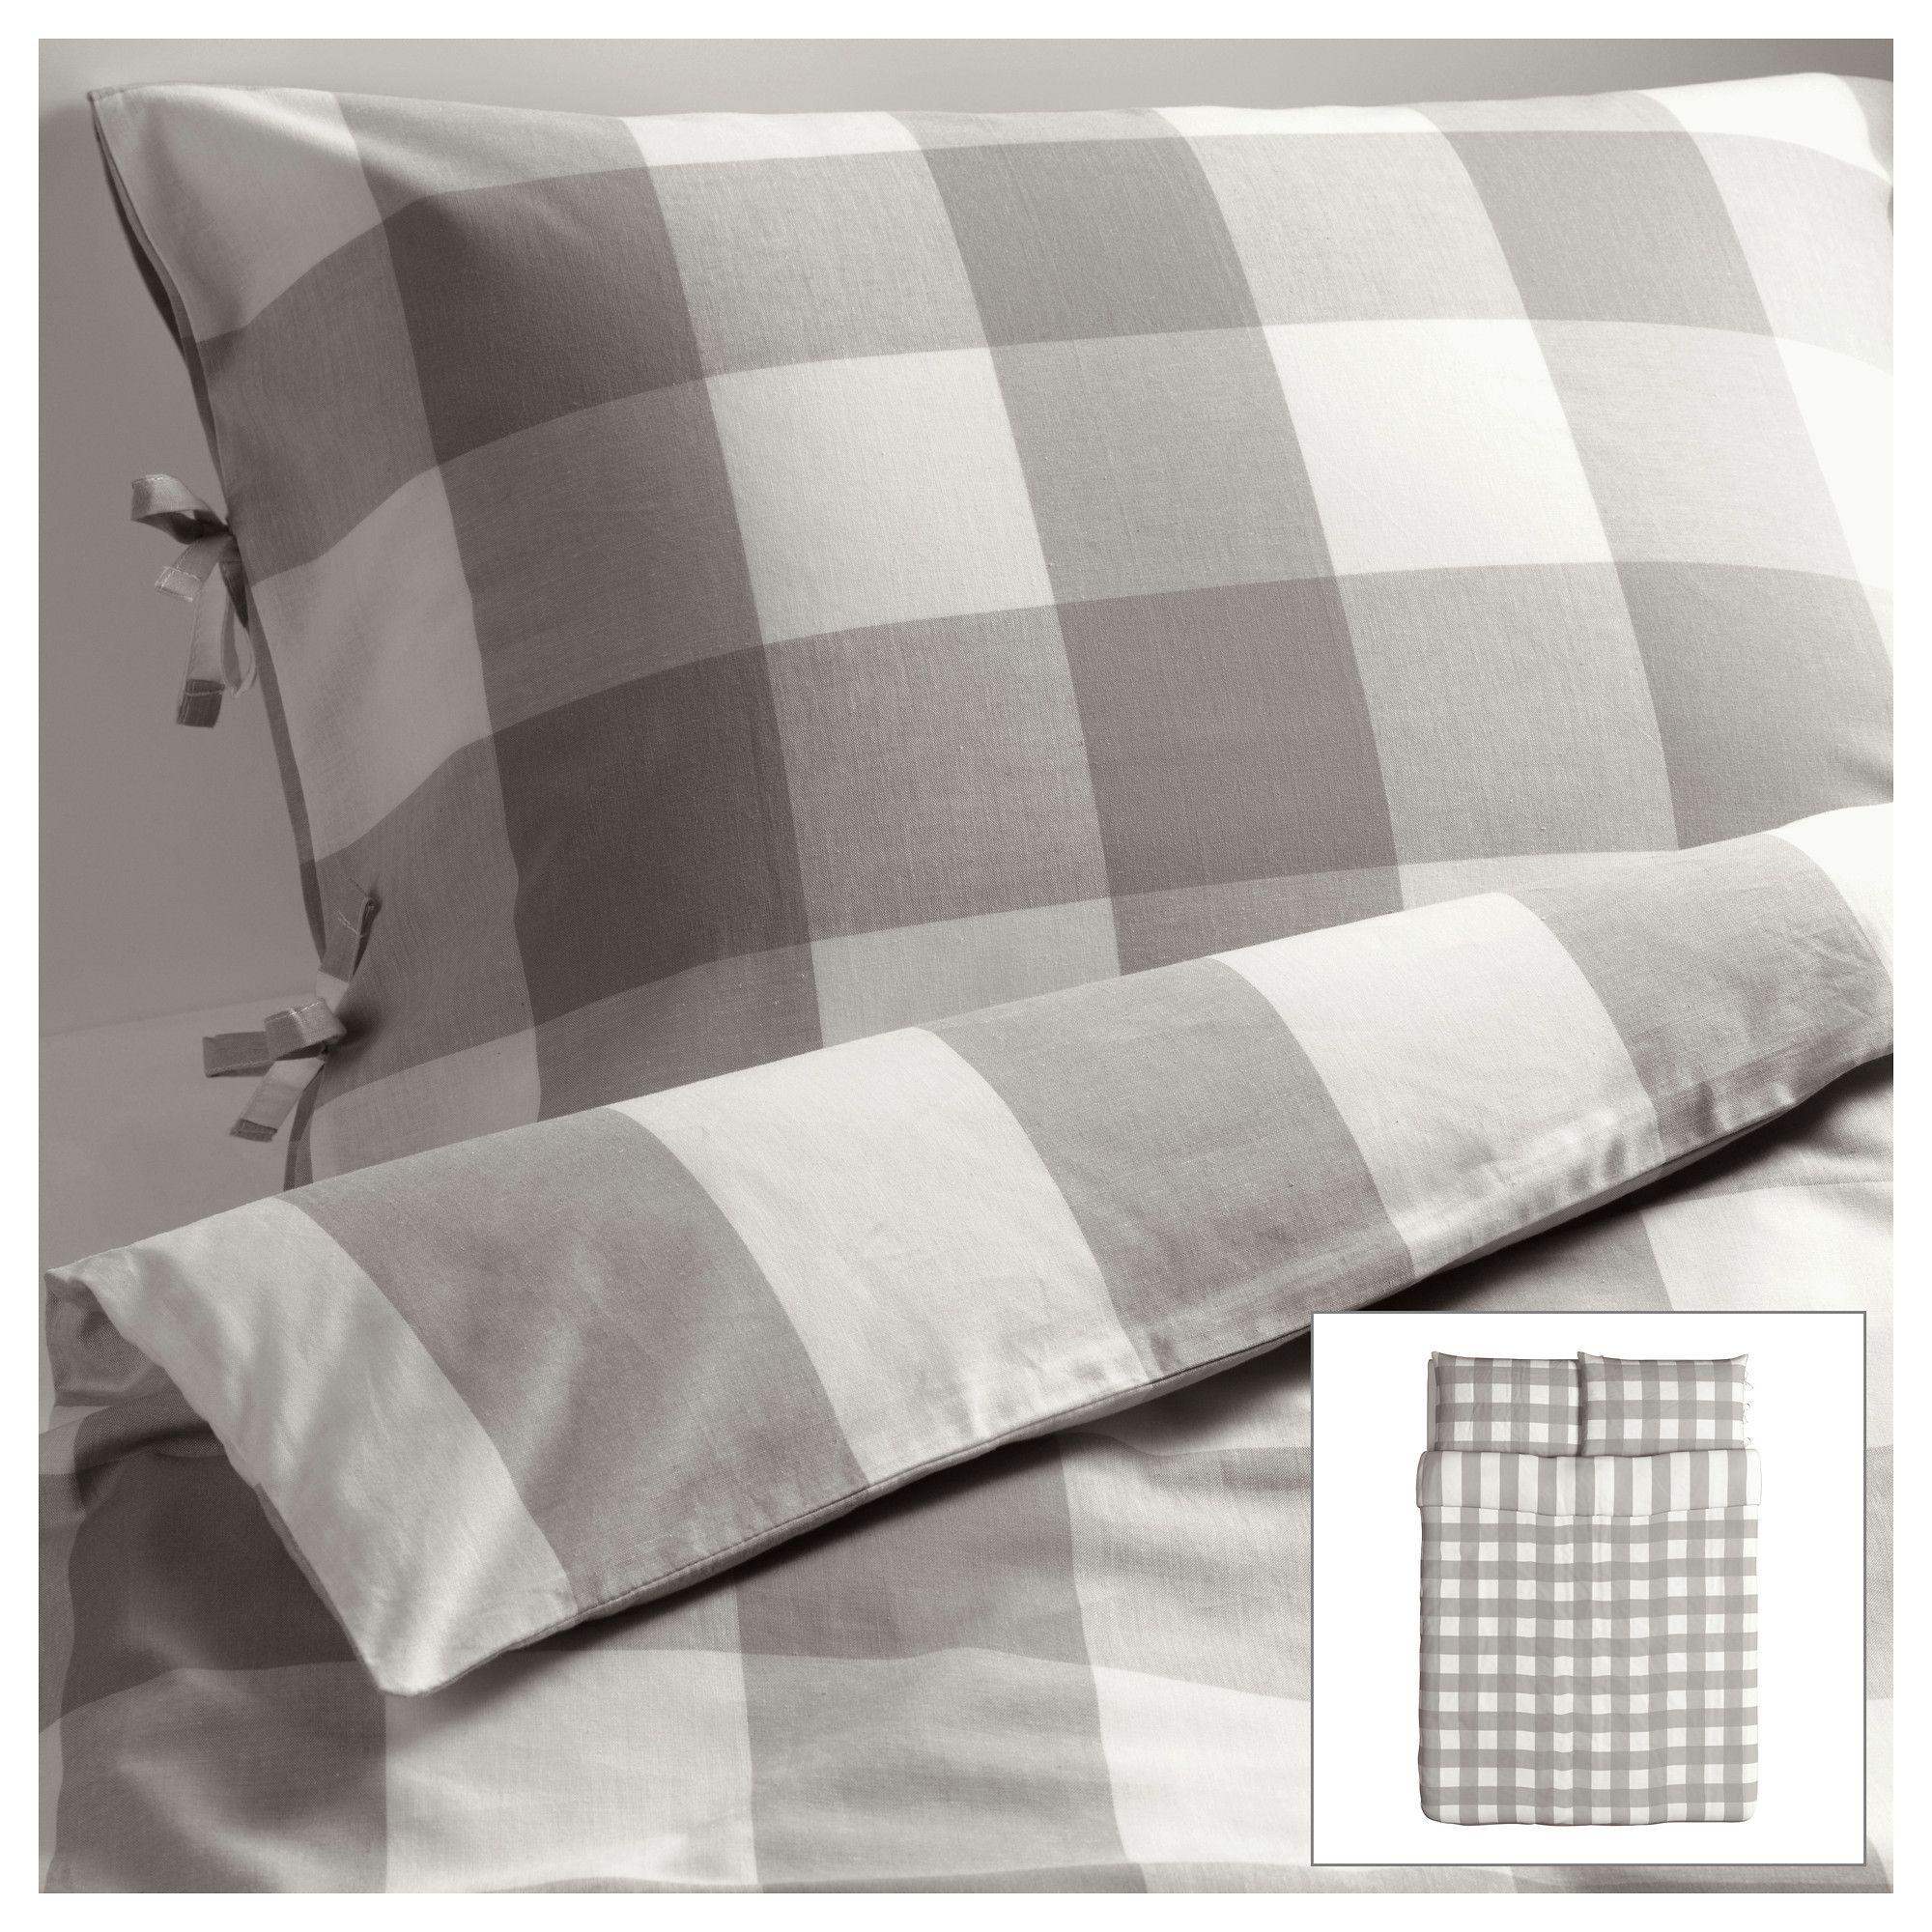 Us Furniture And Home Furnishings Ikea Duvet Cover Ikea Duvet Ikea Bed